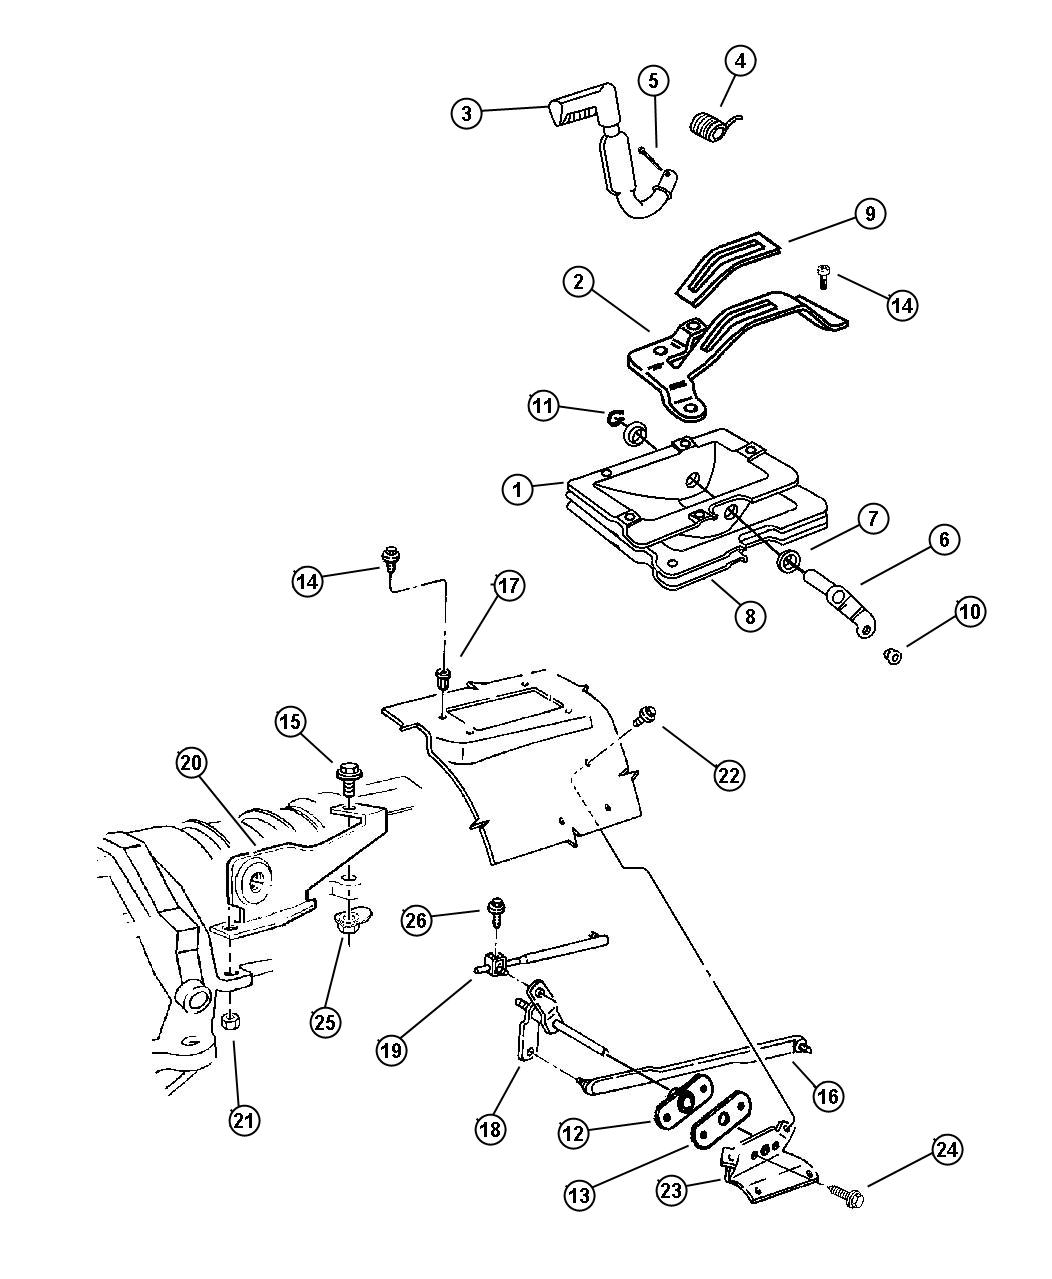 jeep 231 transfer case diagram